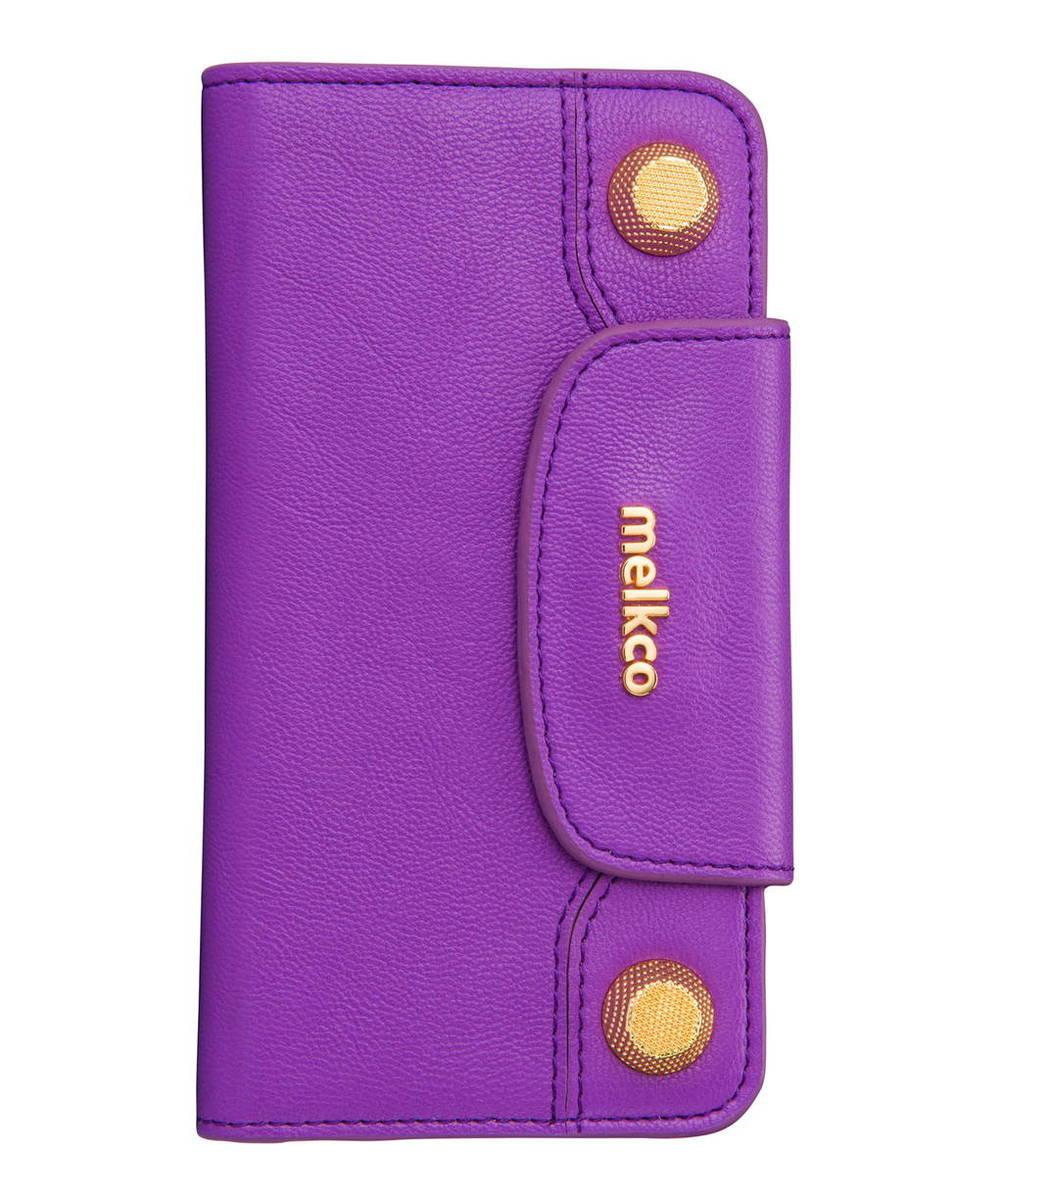 "iPhone 6/6S- 4.7"" Sarina 系列  高级真牛皮手機套 - 紫色"